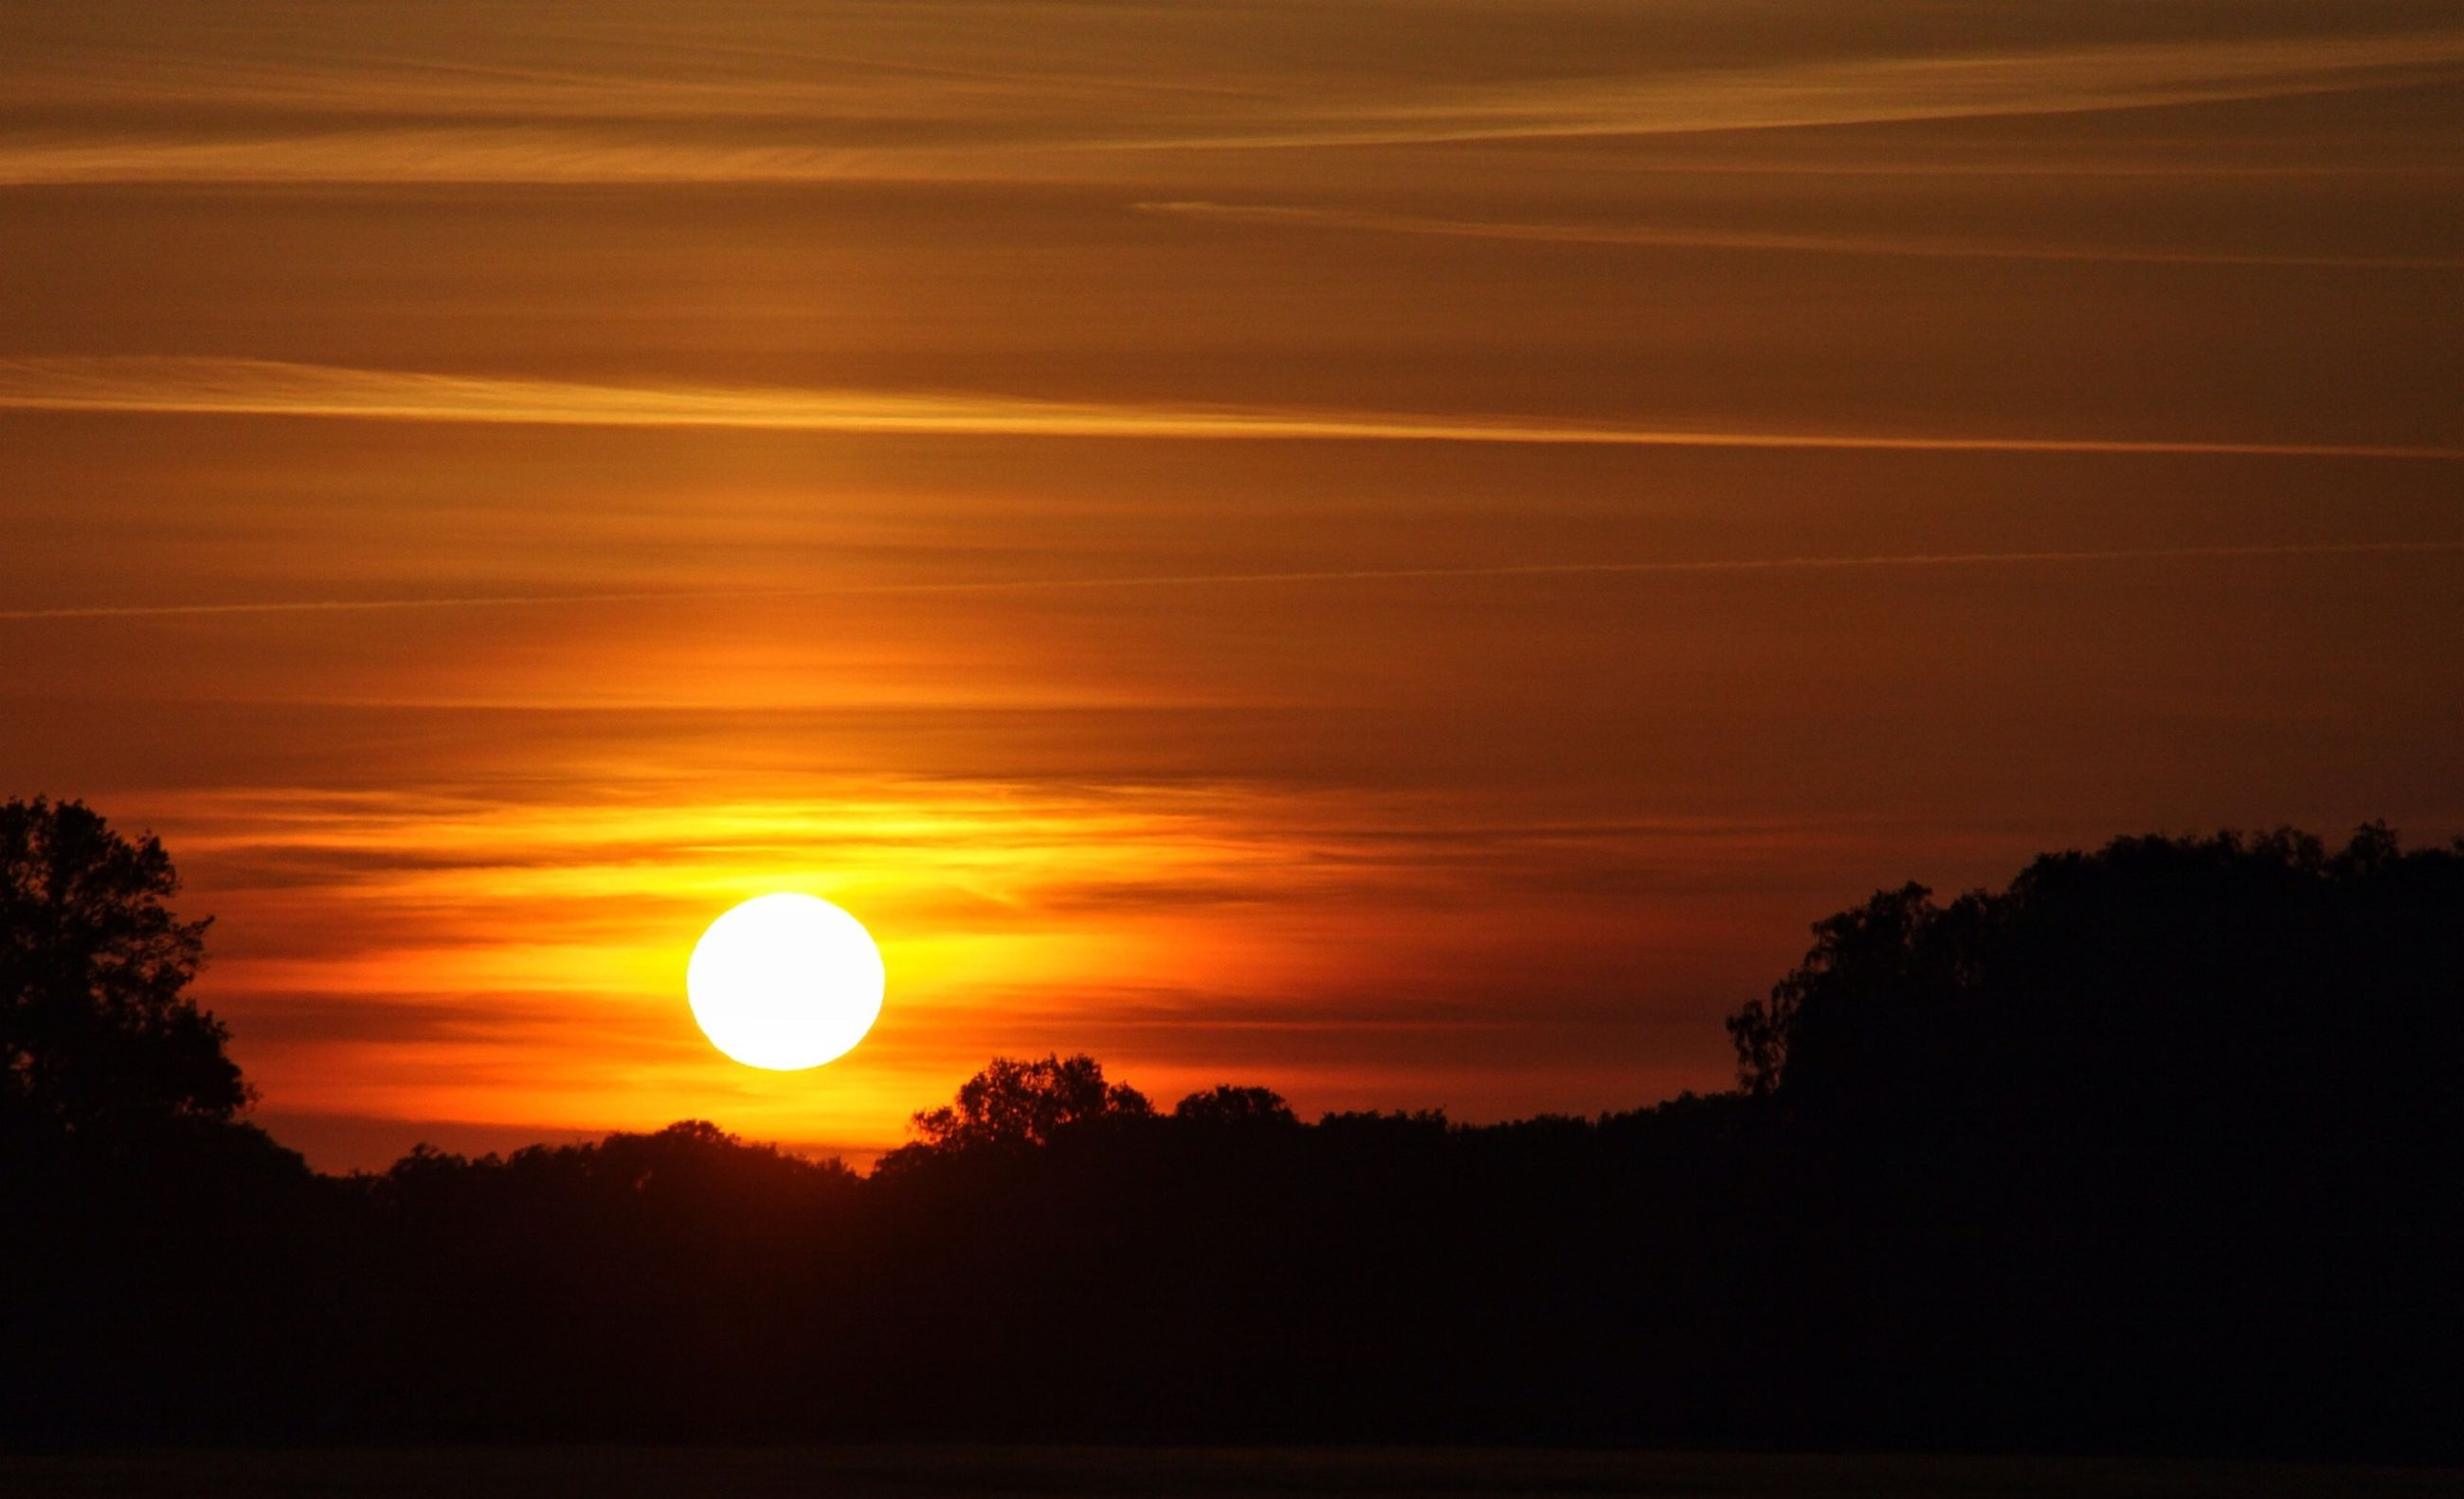 sunset, silhouette, sun, scenics, tranquil scene, orange color, tranquility, beauty in nature, sky, idyllic, nature, tree, landscape, sunlight, dark, majestic, outdoors, cloud - sky, non-urban scene, no people